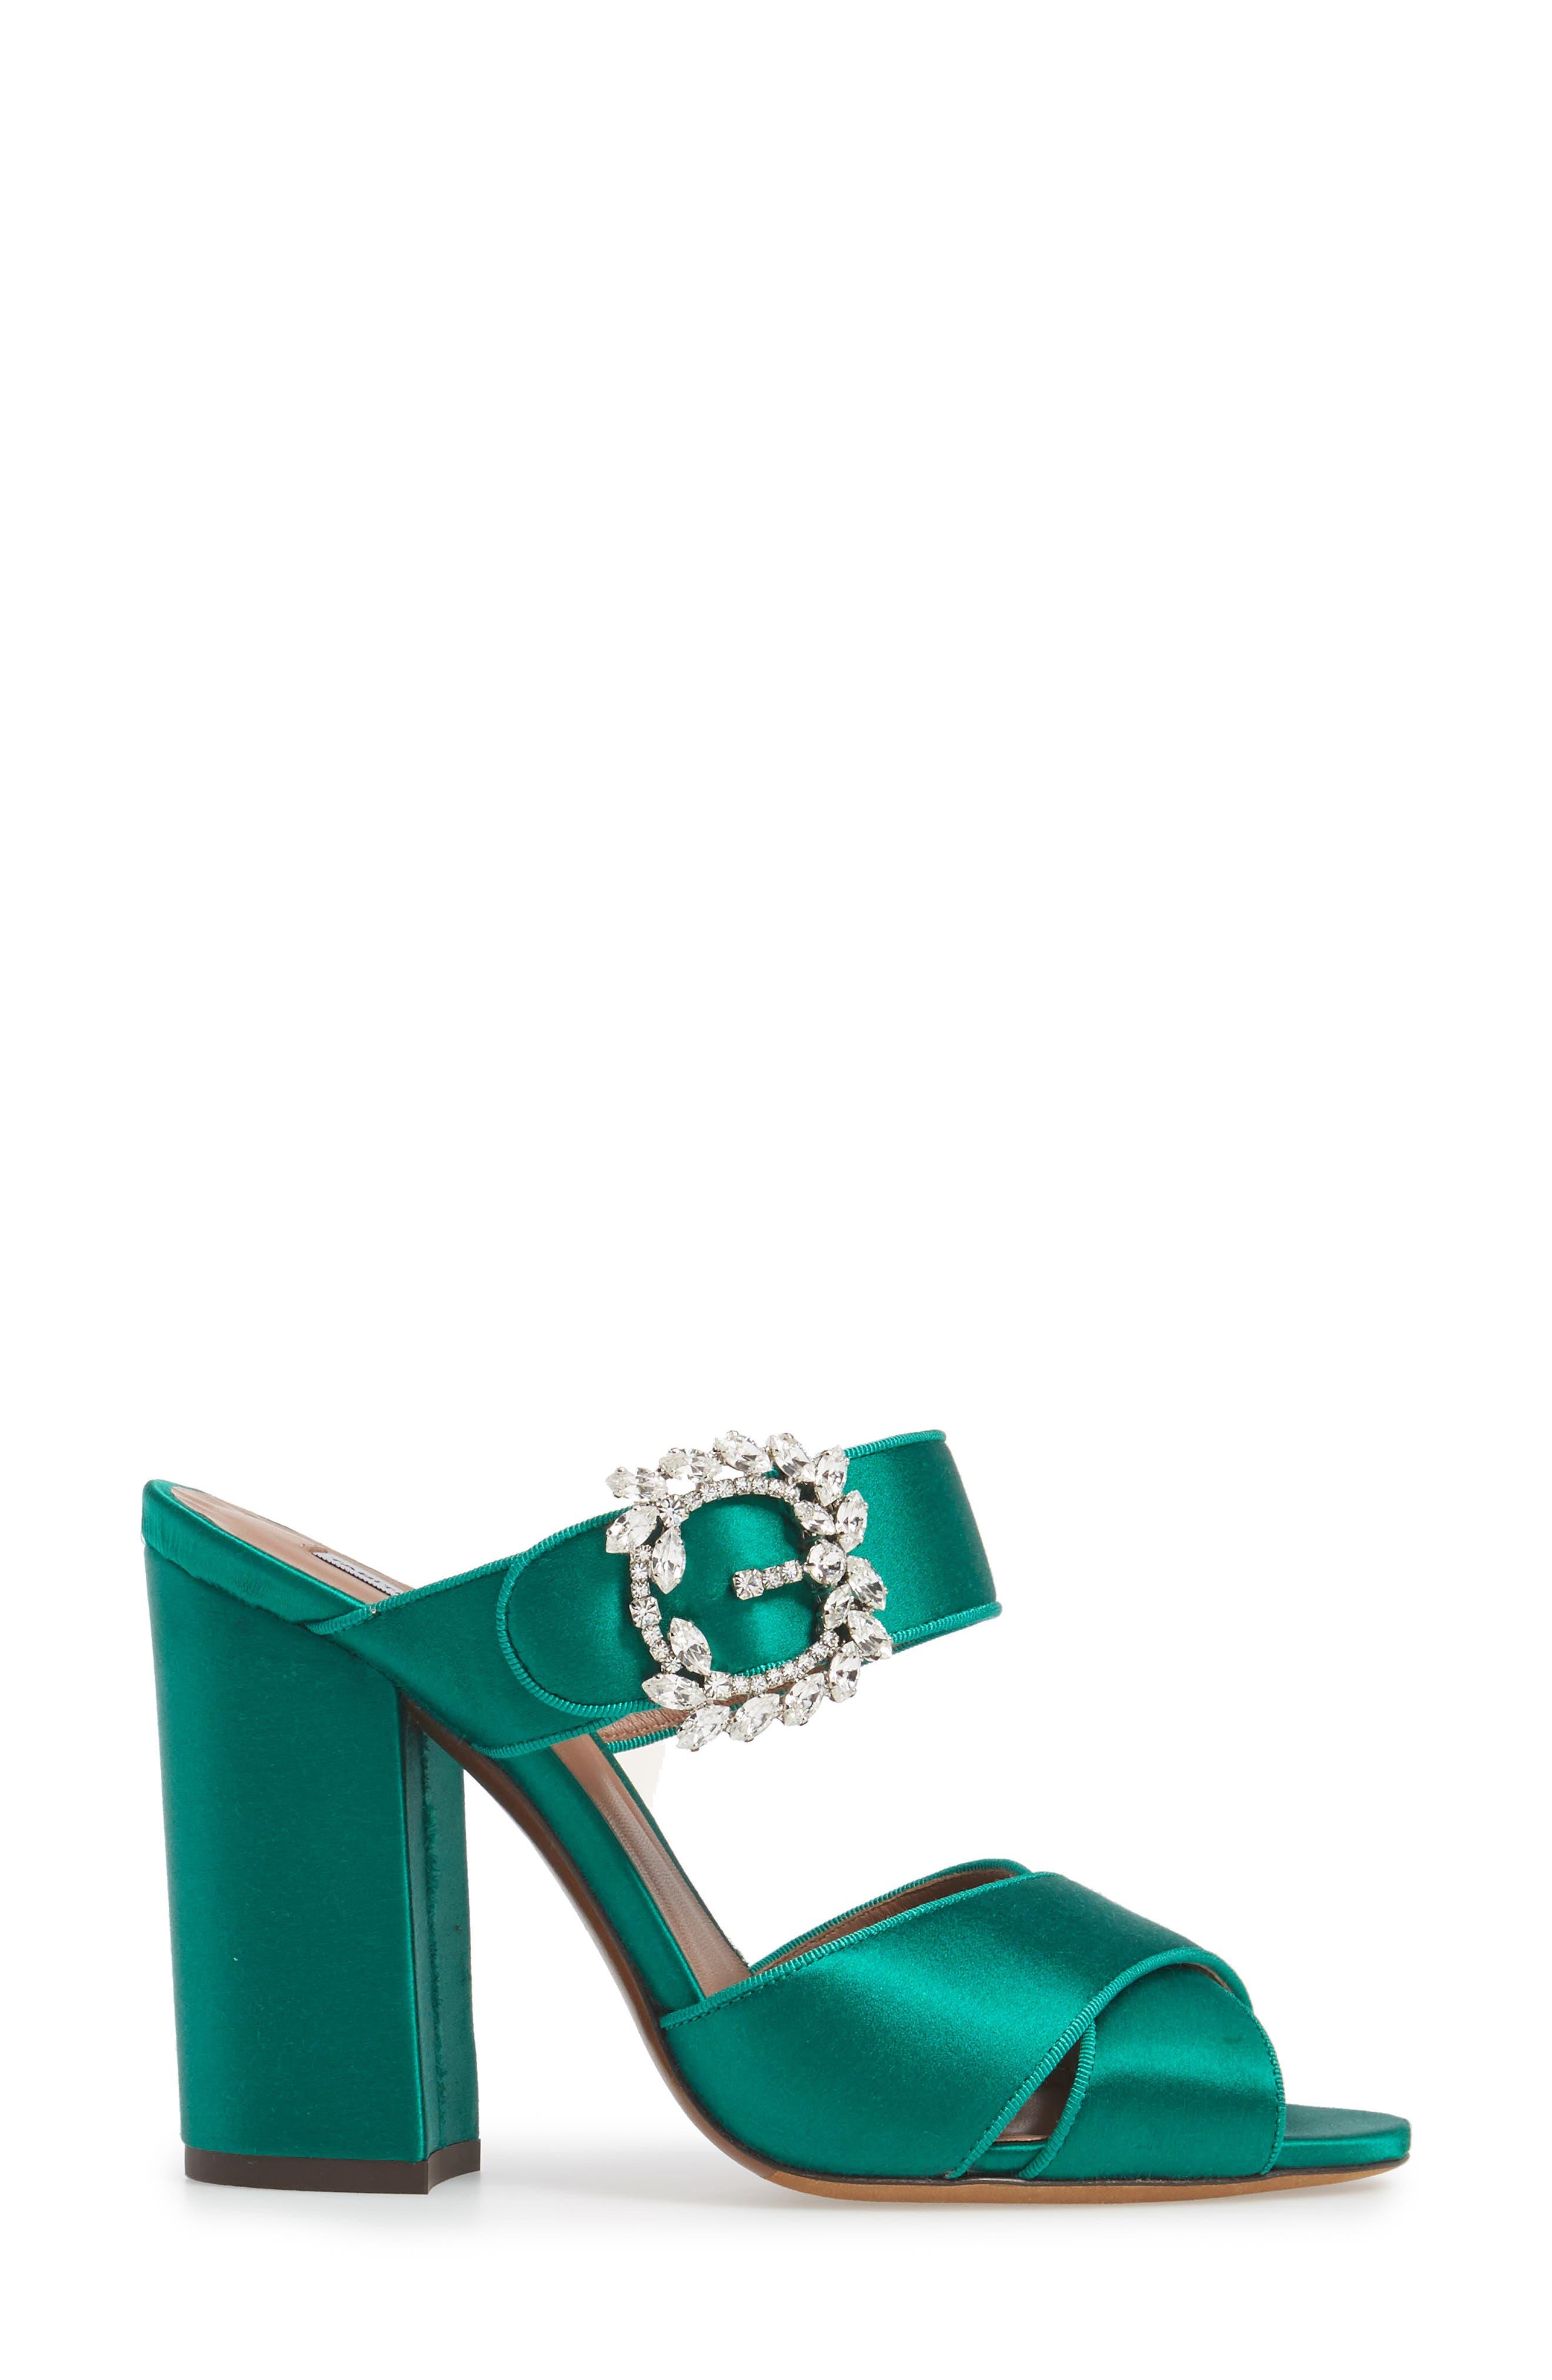 Reyner Crystal Buckle Sandal,                             Alternate thumbnail 3, color,                             Emerald Green